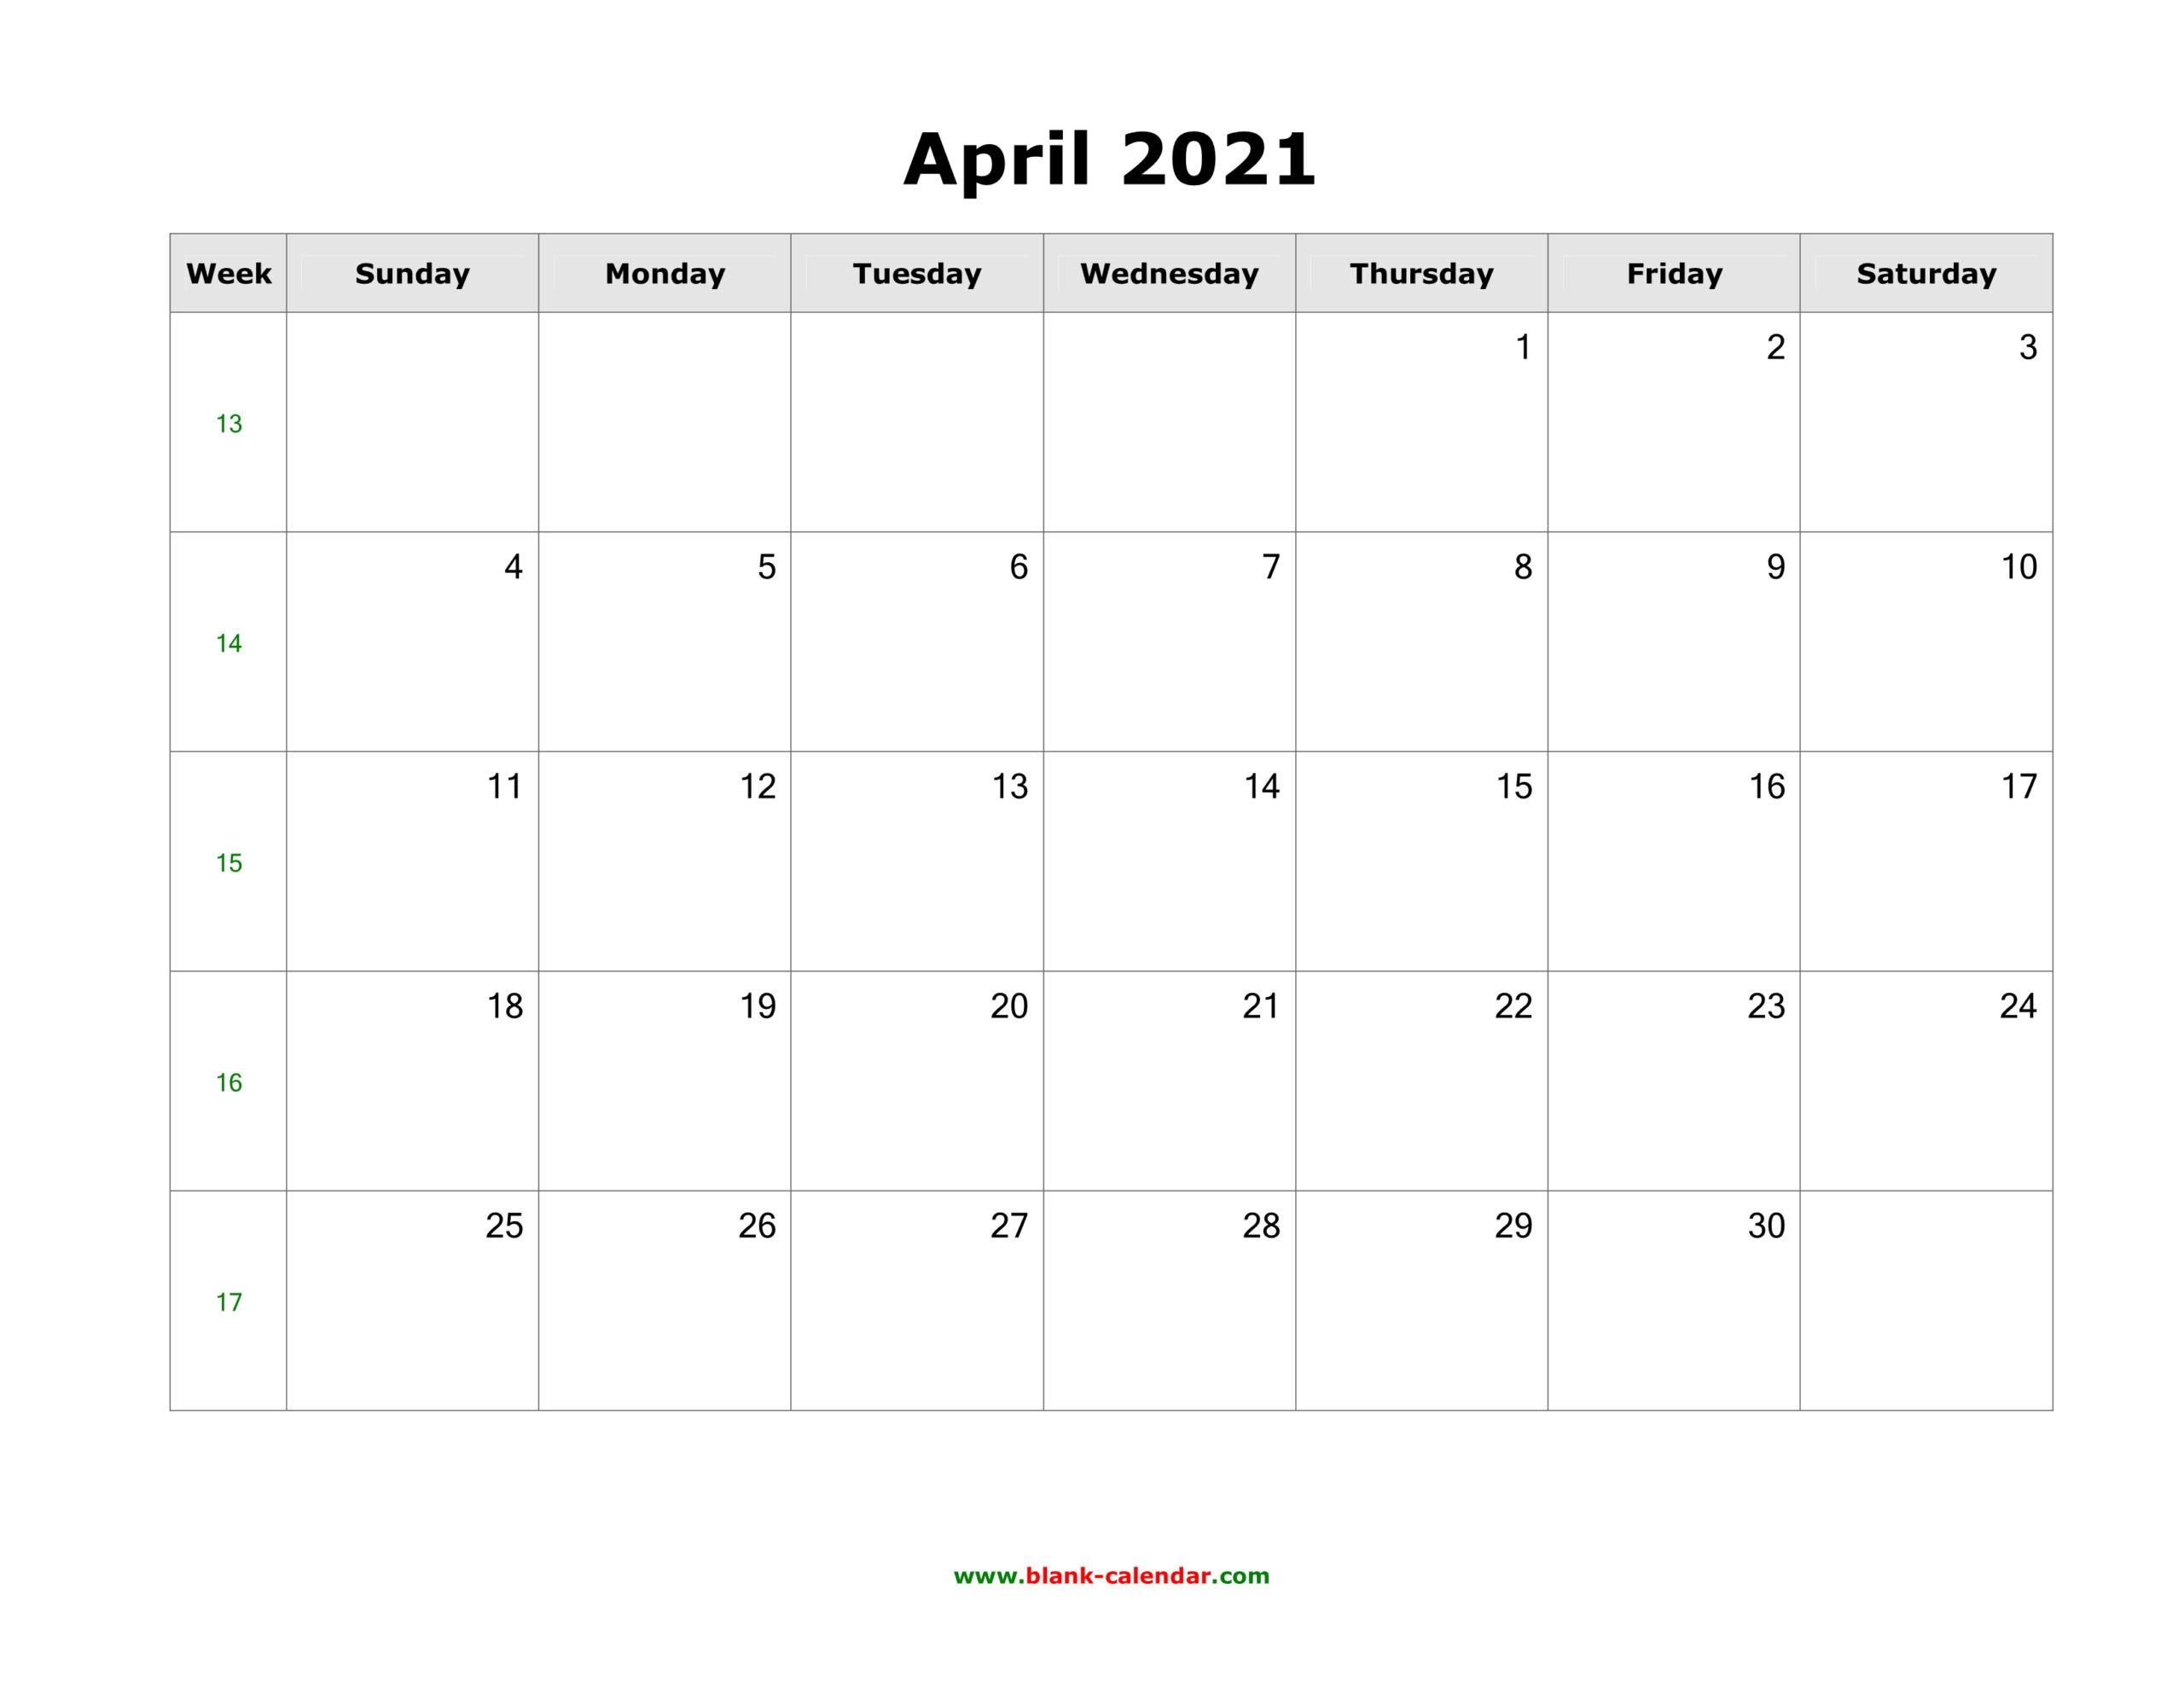 April 2021 Blank Calendar   Free Download Calendar Templates within Google Printable Monthly Calendar 2021